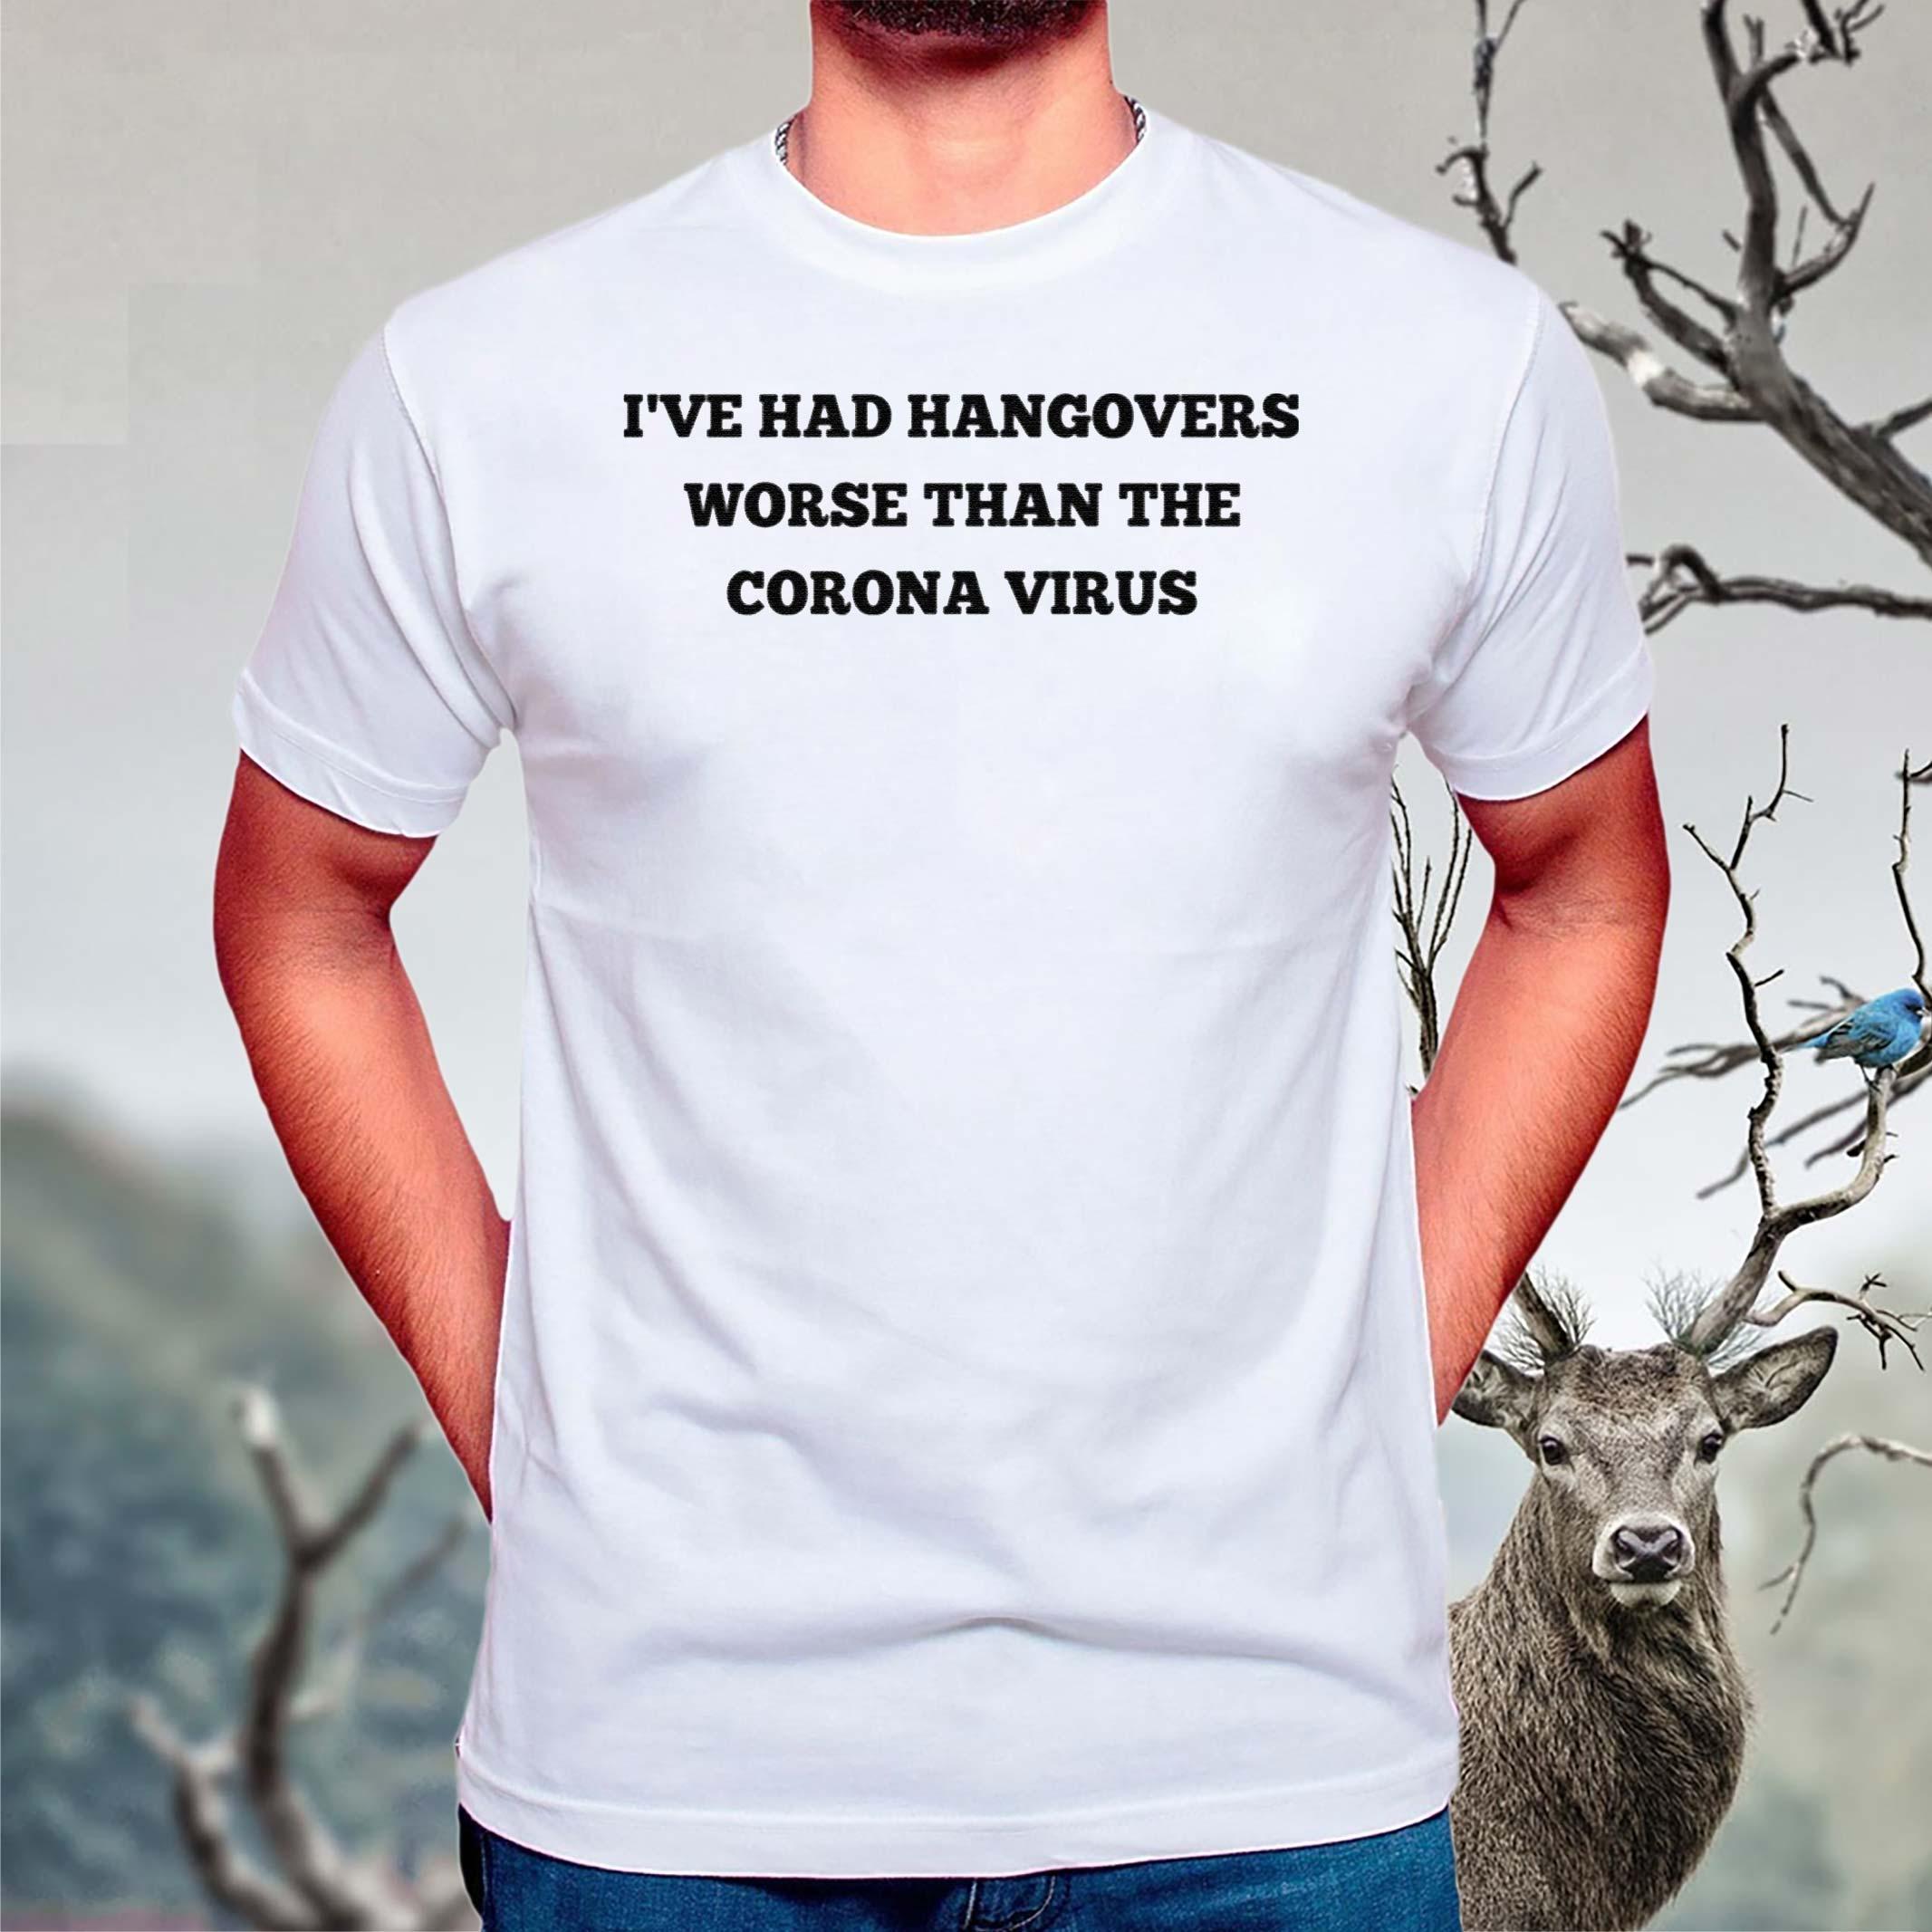 I've-Had-Hangovers-Worse-Than-The-Corona-Virus-shirts